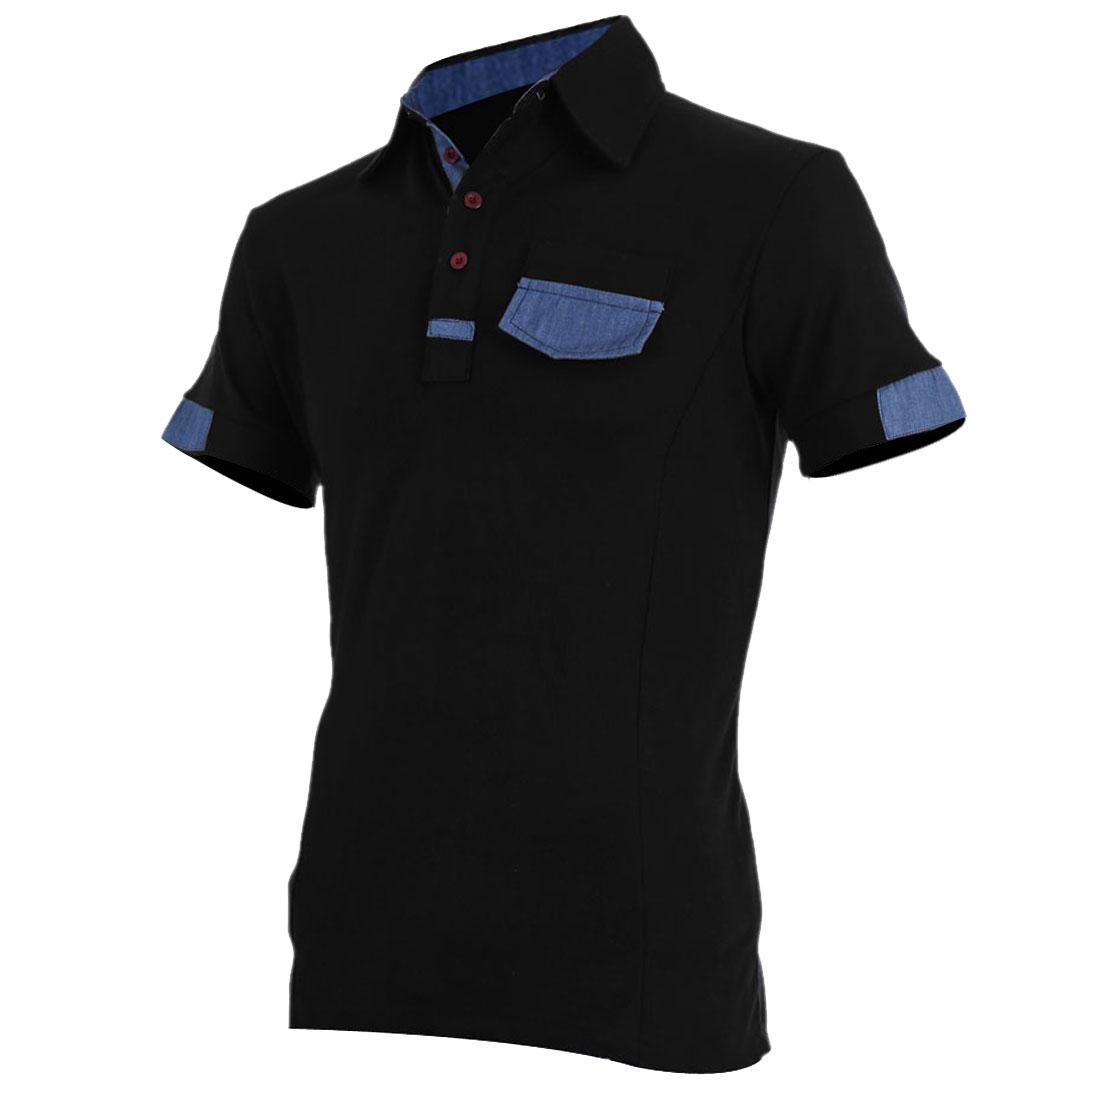 Men Fake Chest Pocket Decor Fitted Short Sleeve Polo Shirt Black M